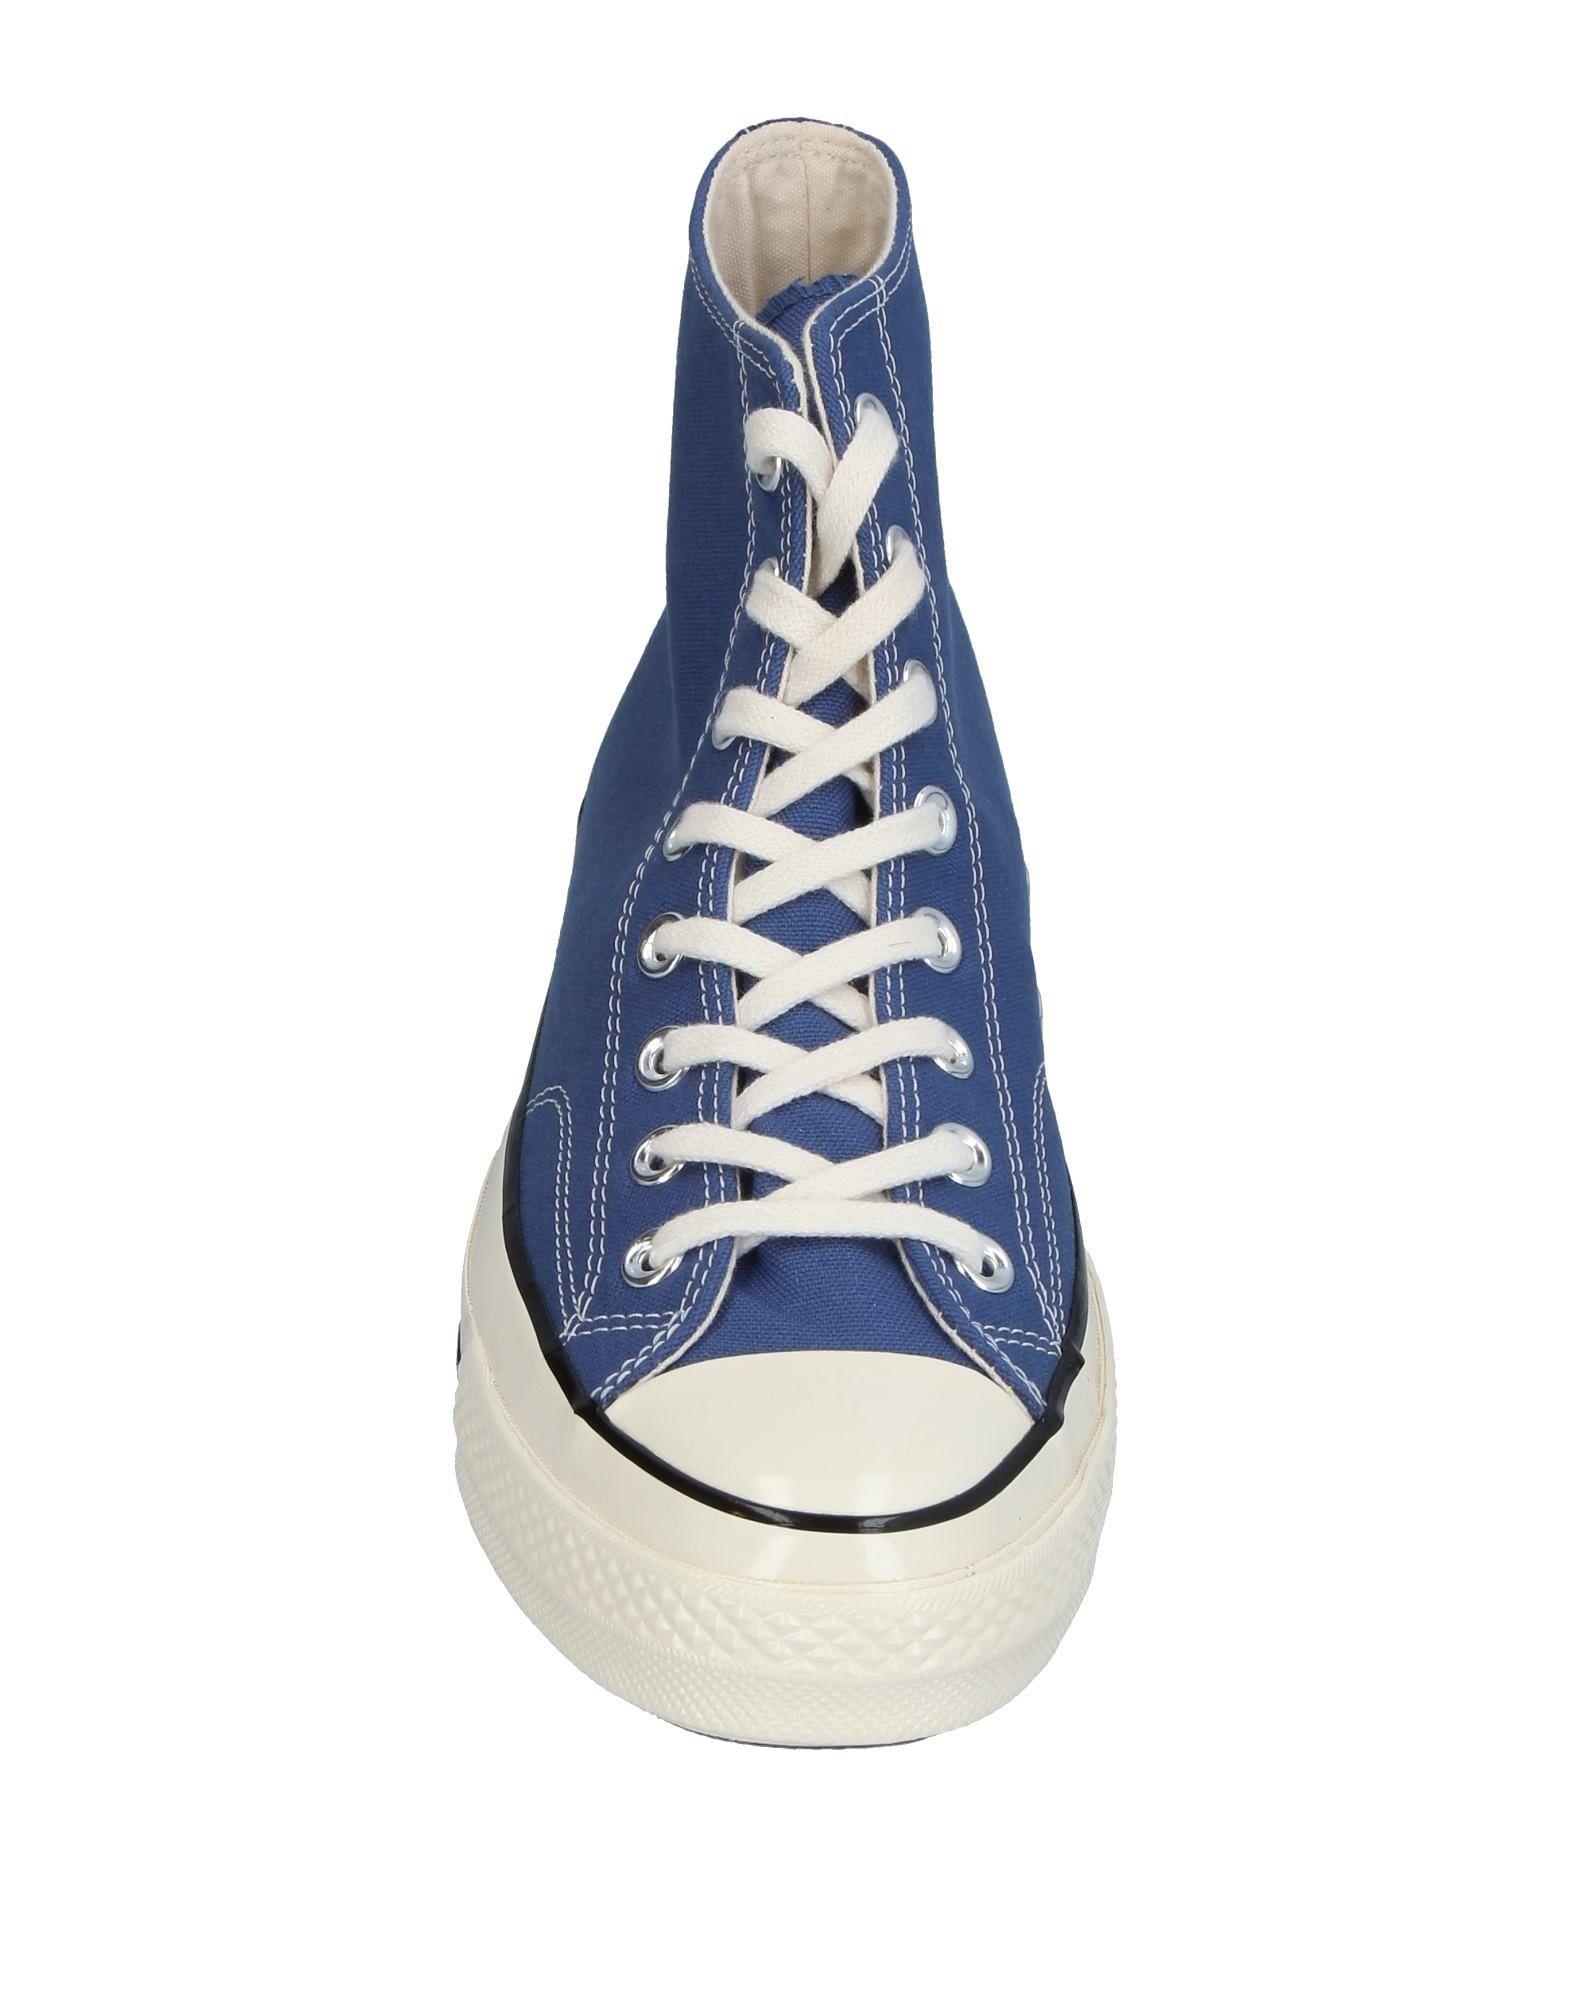 Rabatt echte Sneakers Schuhe Converse All Star Sneakers echte Herren  11327708FJ e7189c